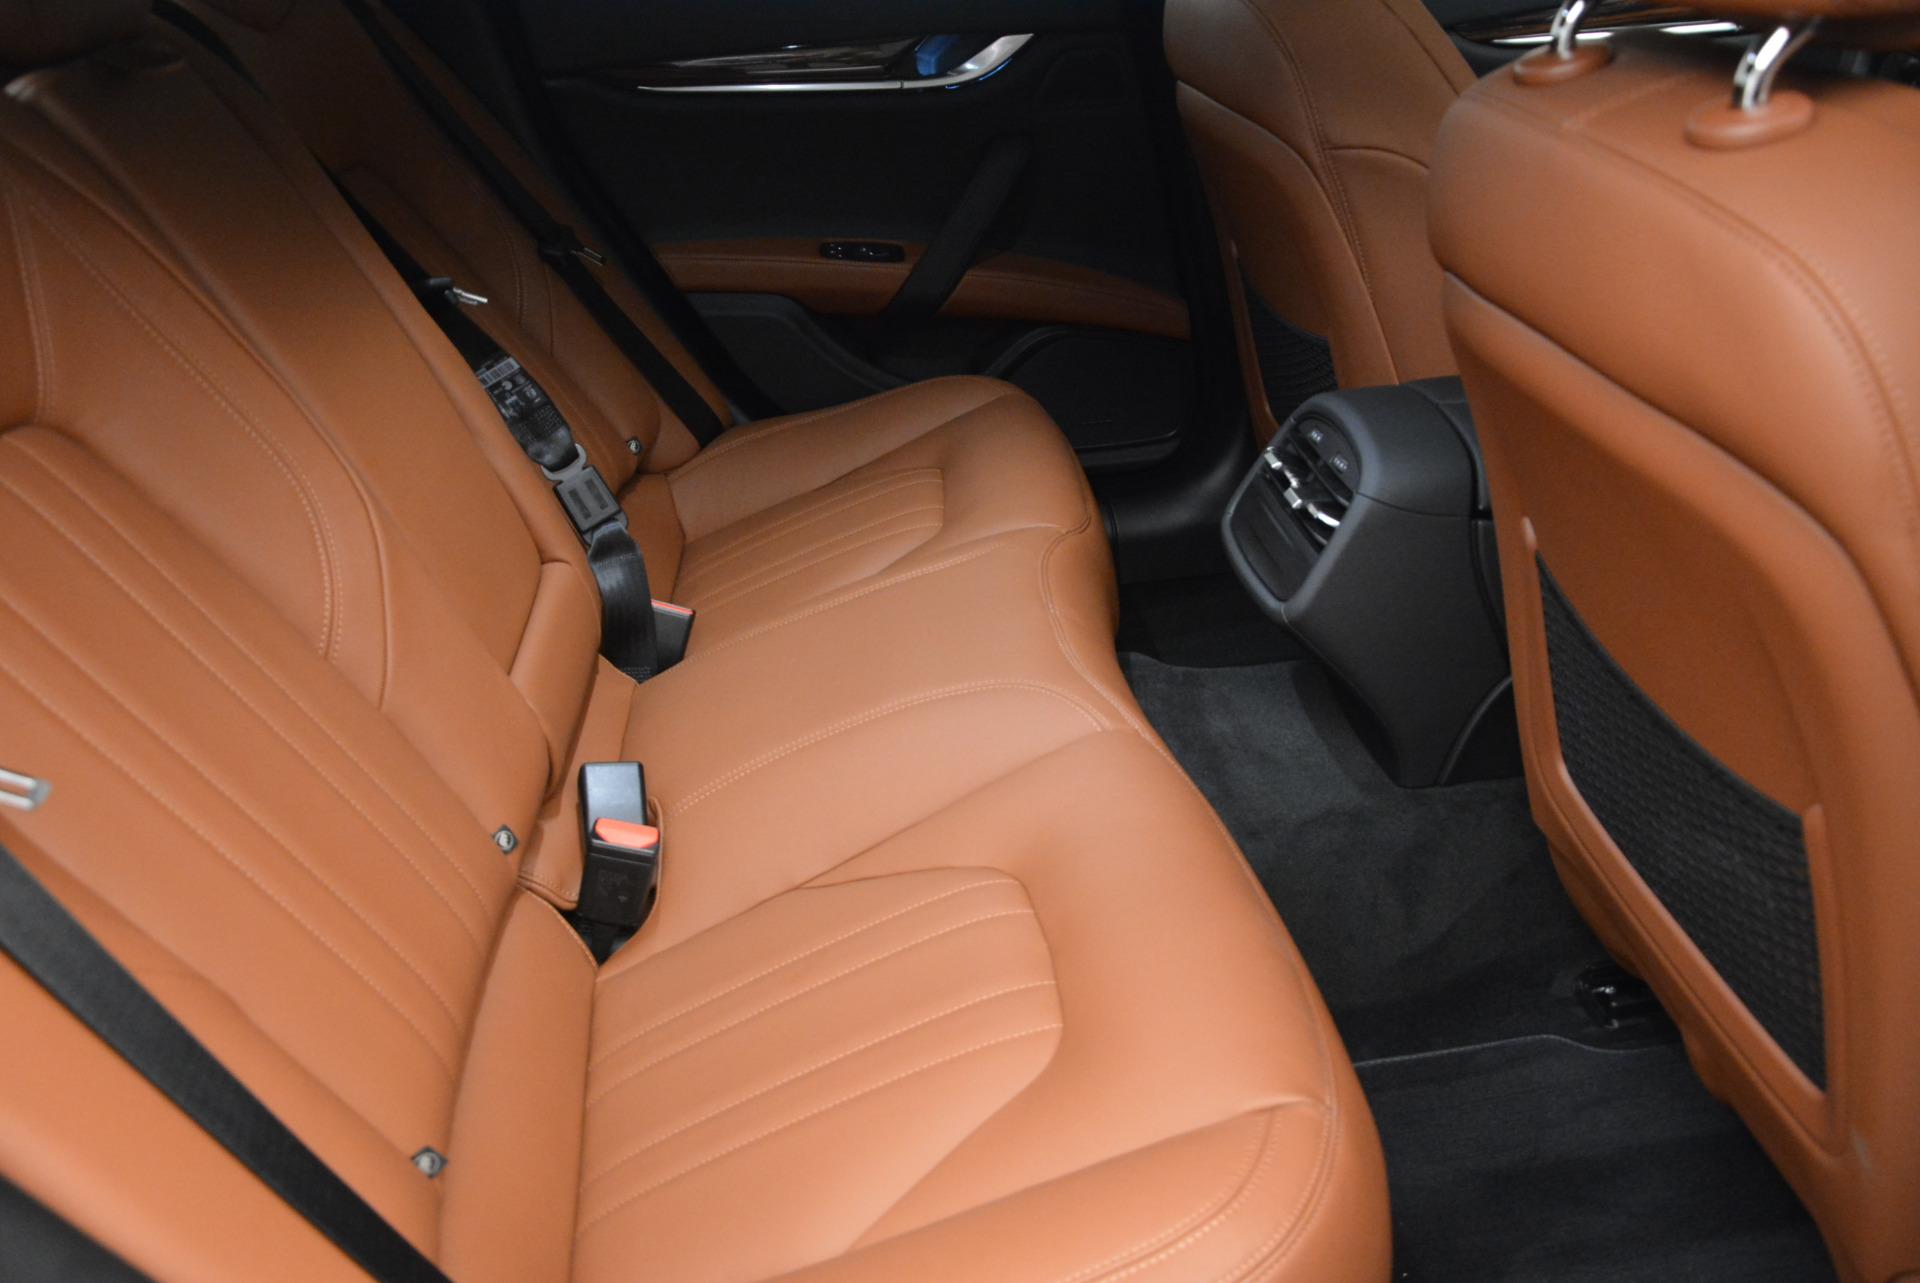 Used 2017 Maserati Ghibli S Q4 - EX Loaner For Sale In Greenwich, CT 568_p23